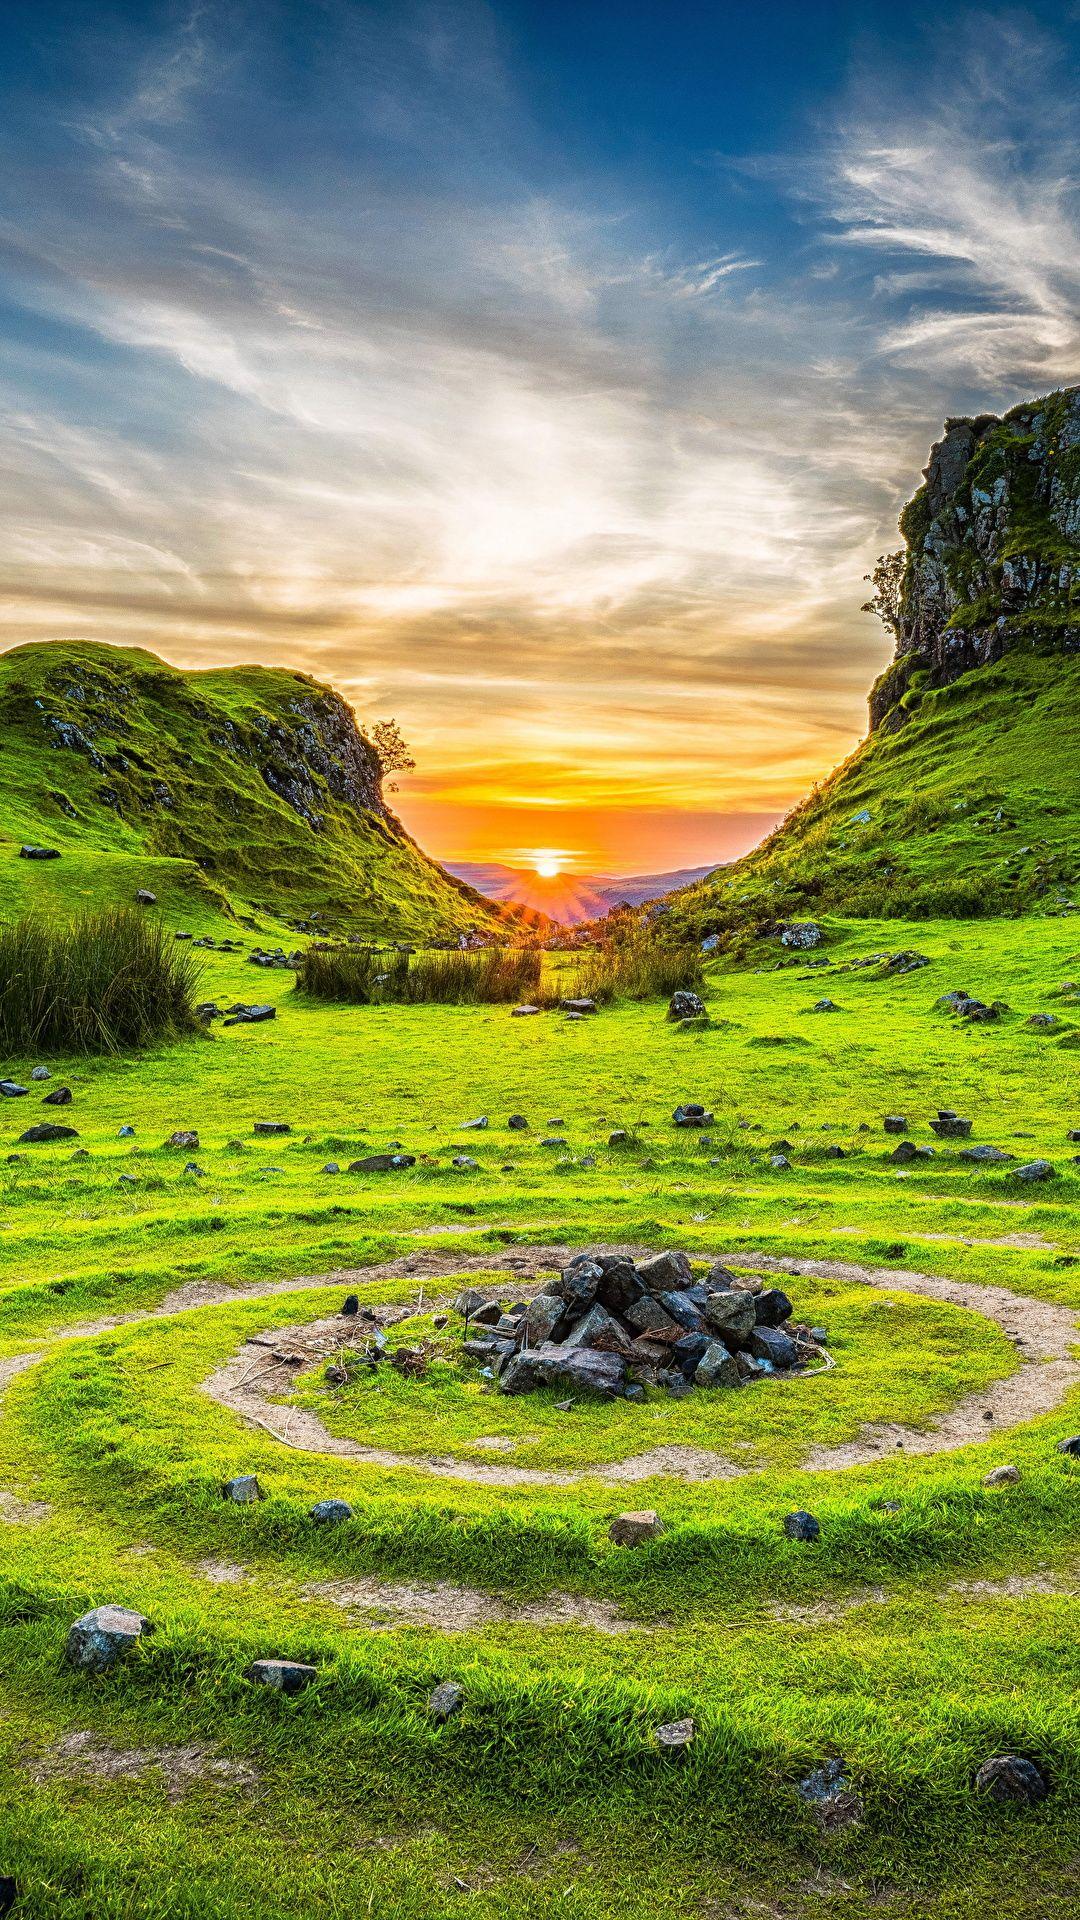 Scenery Sunrises And Sunsets Sky Stones Grass Circles Nature Photo